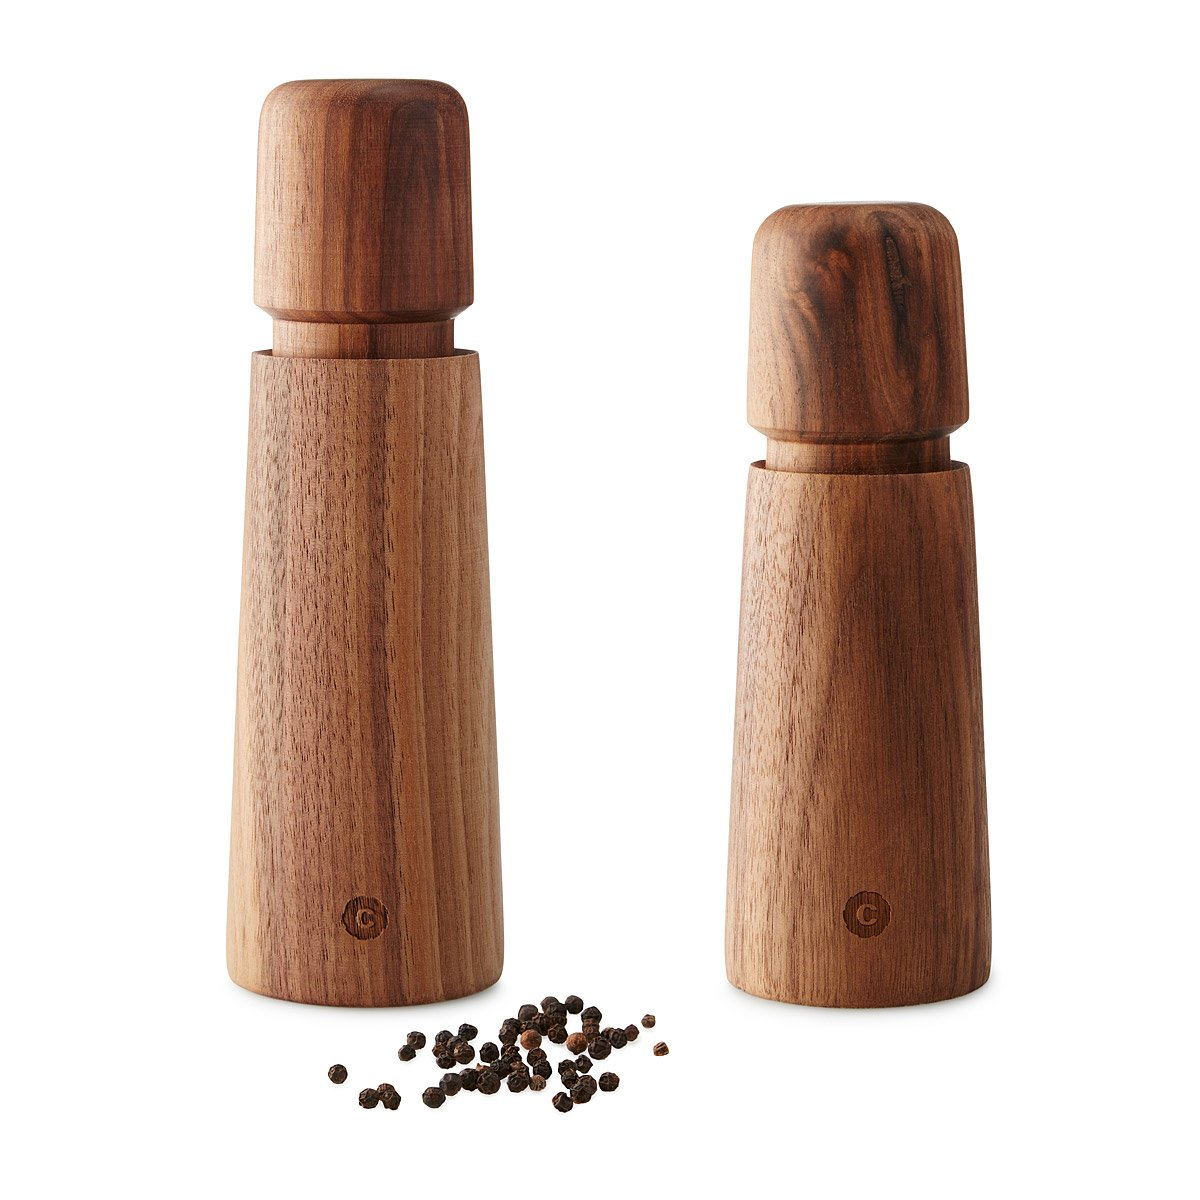 ocean reel salt and pepper mills  fishing decor salt and pepper  - push or twist salt or pepper grinders